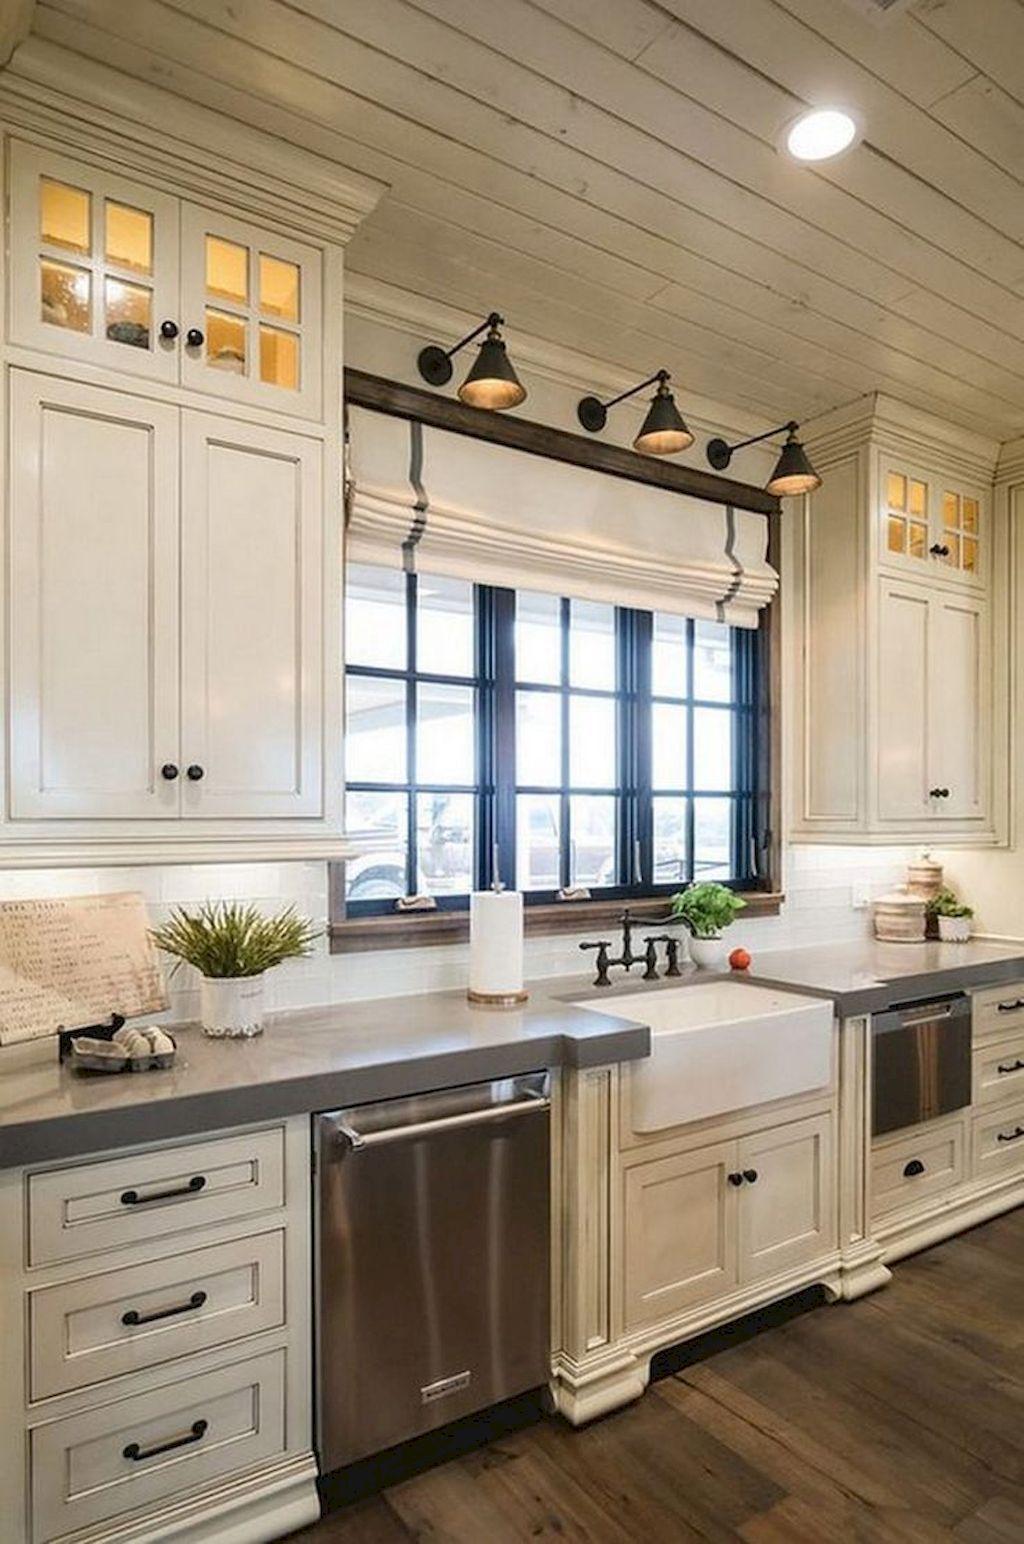 Clean Rustic Kitchen Decor Ideas Rustic kitchen decor Rustic